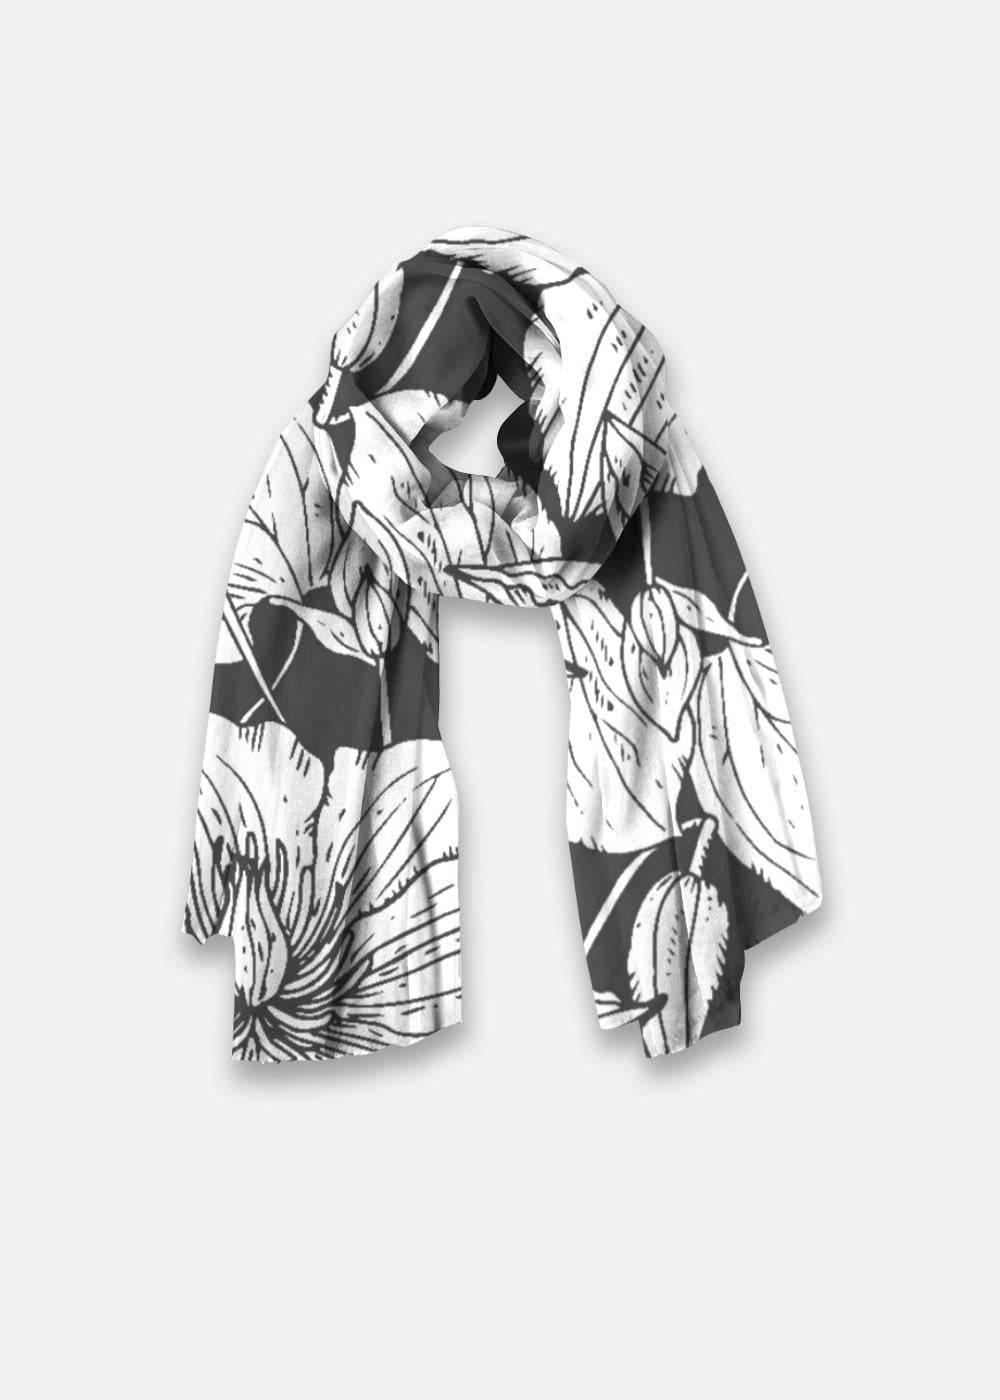 VIDA Oversized Merino Wool - Black & White Garden by VIDA Original Artist  - Size: One Size